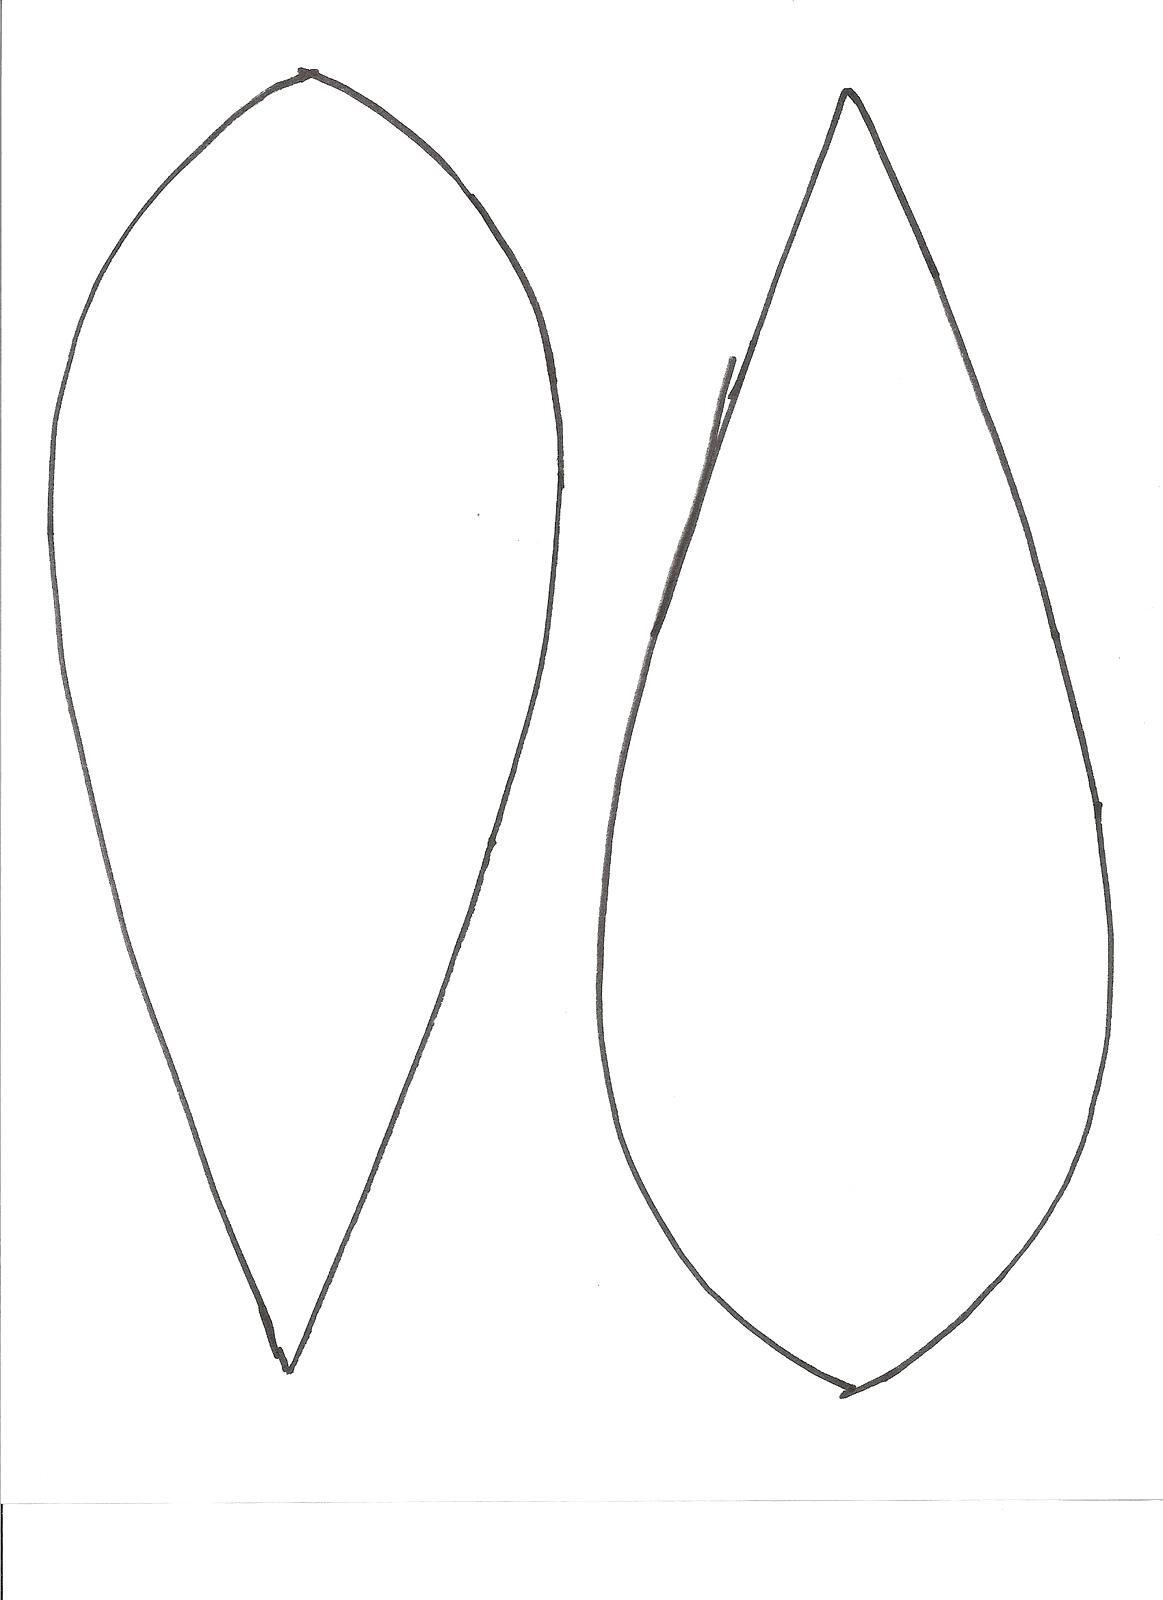 Turkey pattern clipart graphic free download Clip Art Of Turkey Body | Clip Art graphic free download